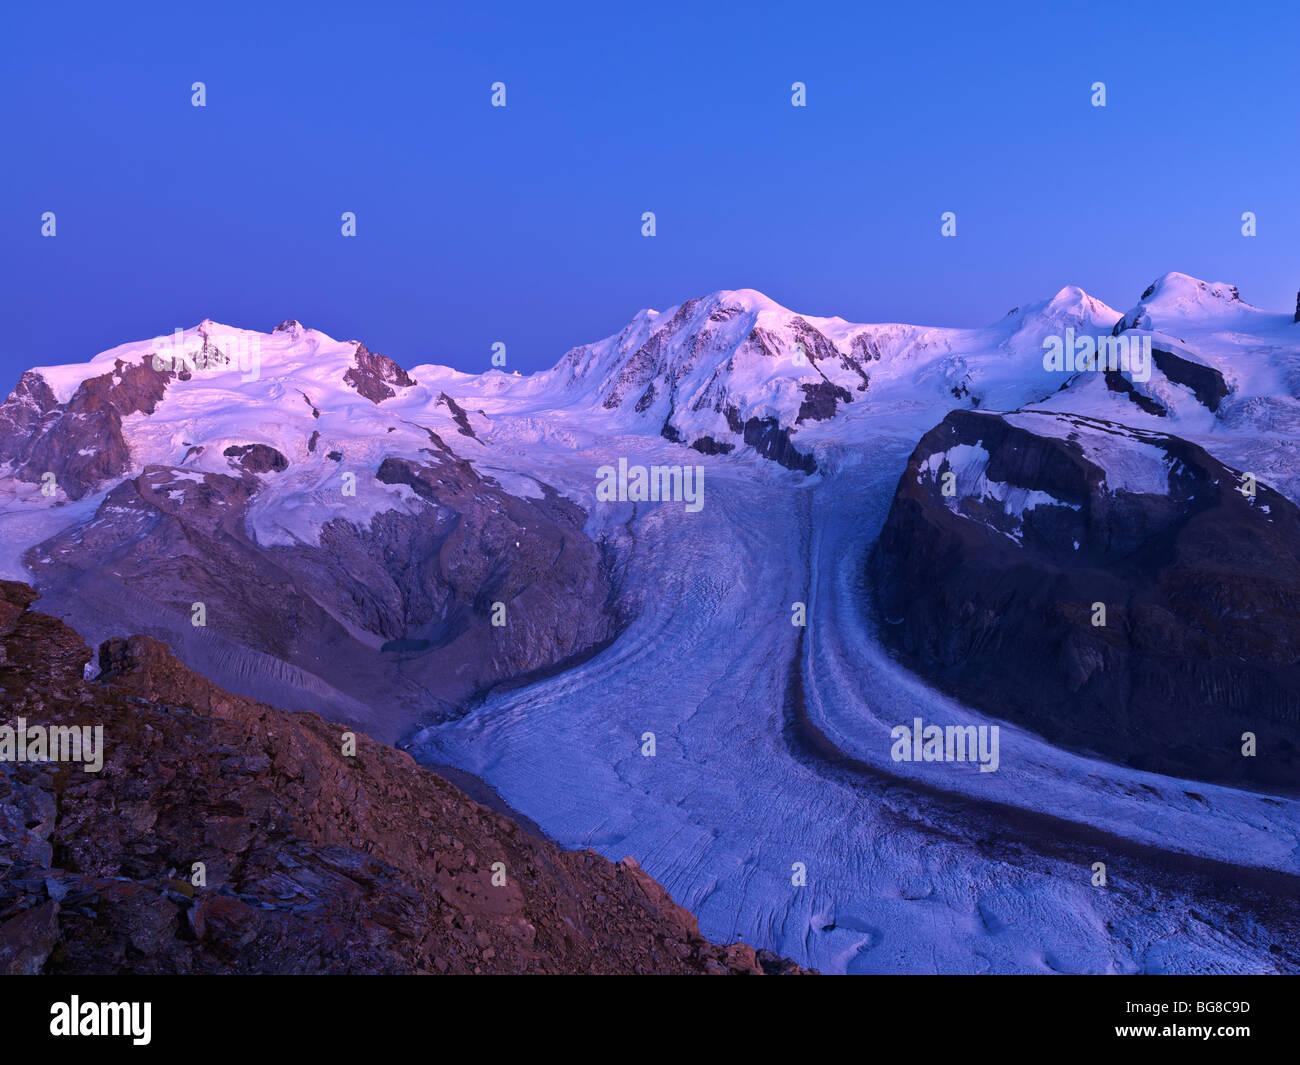 Suisse, Valais, Zermatt Gornergrat,,sommets du Mont Rosa, Liskamm, et le glacier du Gorner et Breithorn Photo Stock